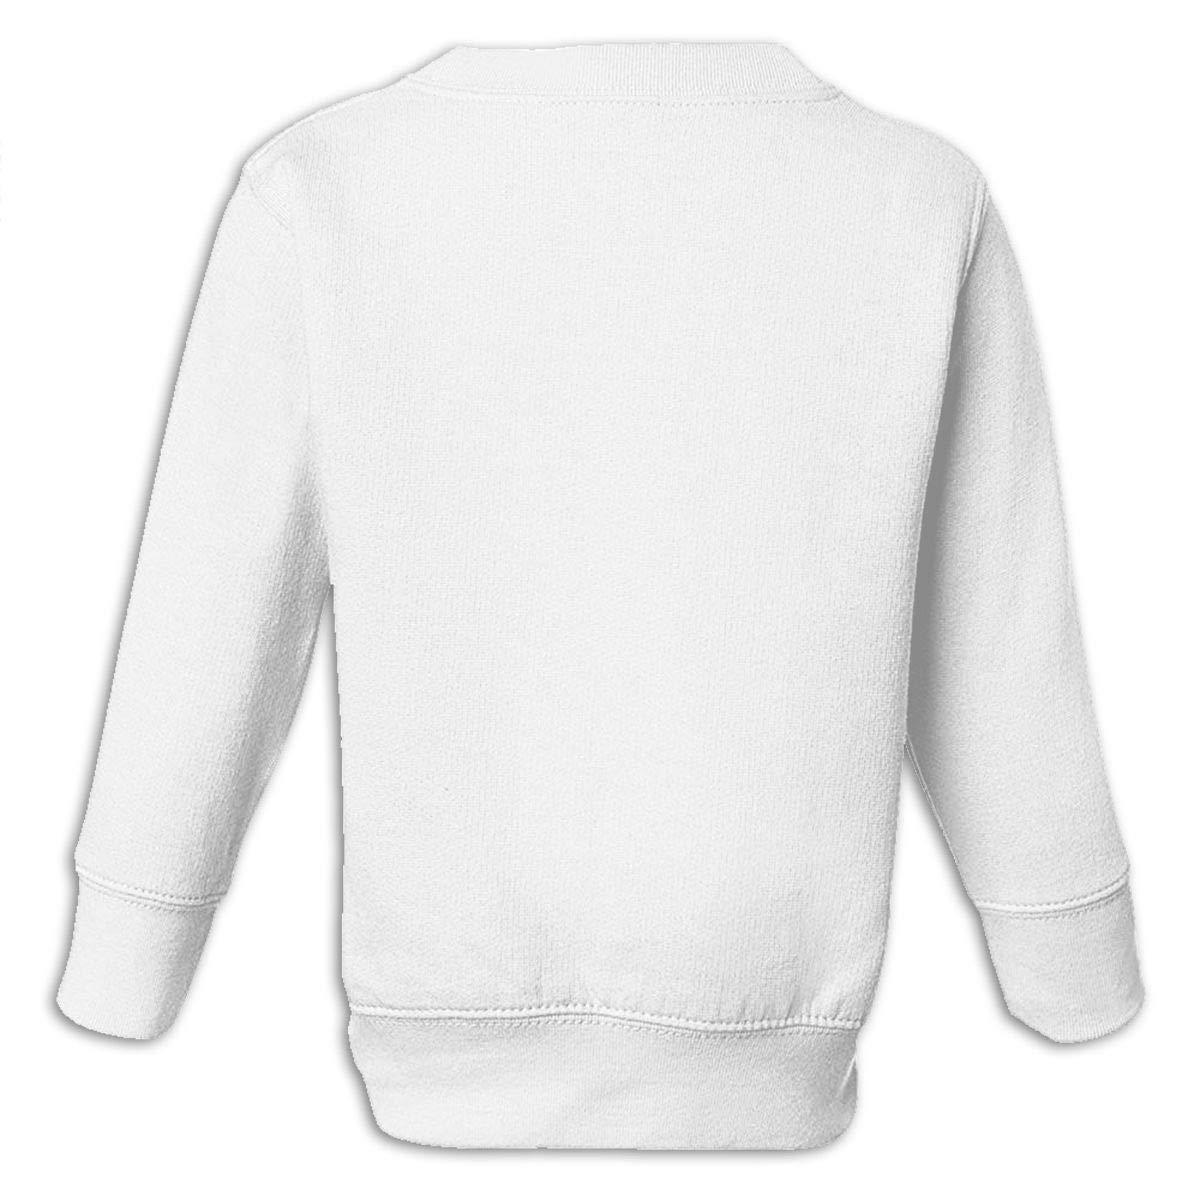 GHYNJUM Bite Me Fish Hook Fishing Juvenile Unisex Cotton Long Sleeve Round Neck Pullover